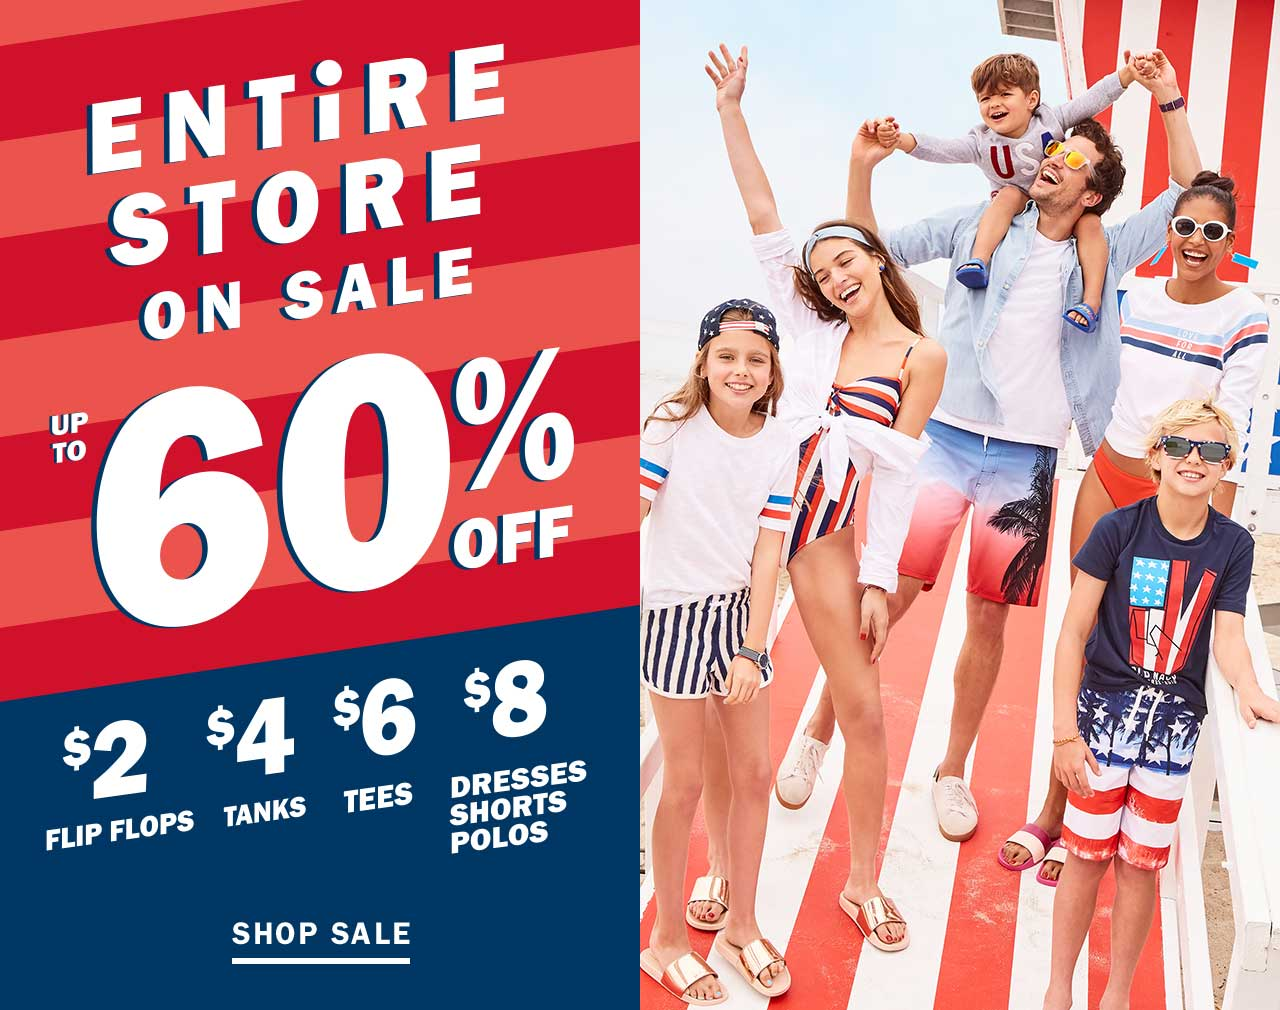 ENTiRE STORE ON SALE | UP TP 60% OFF | SHOP SALE